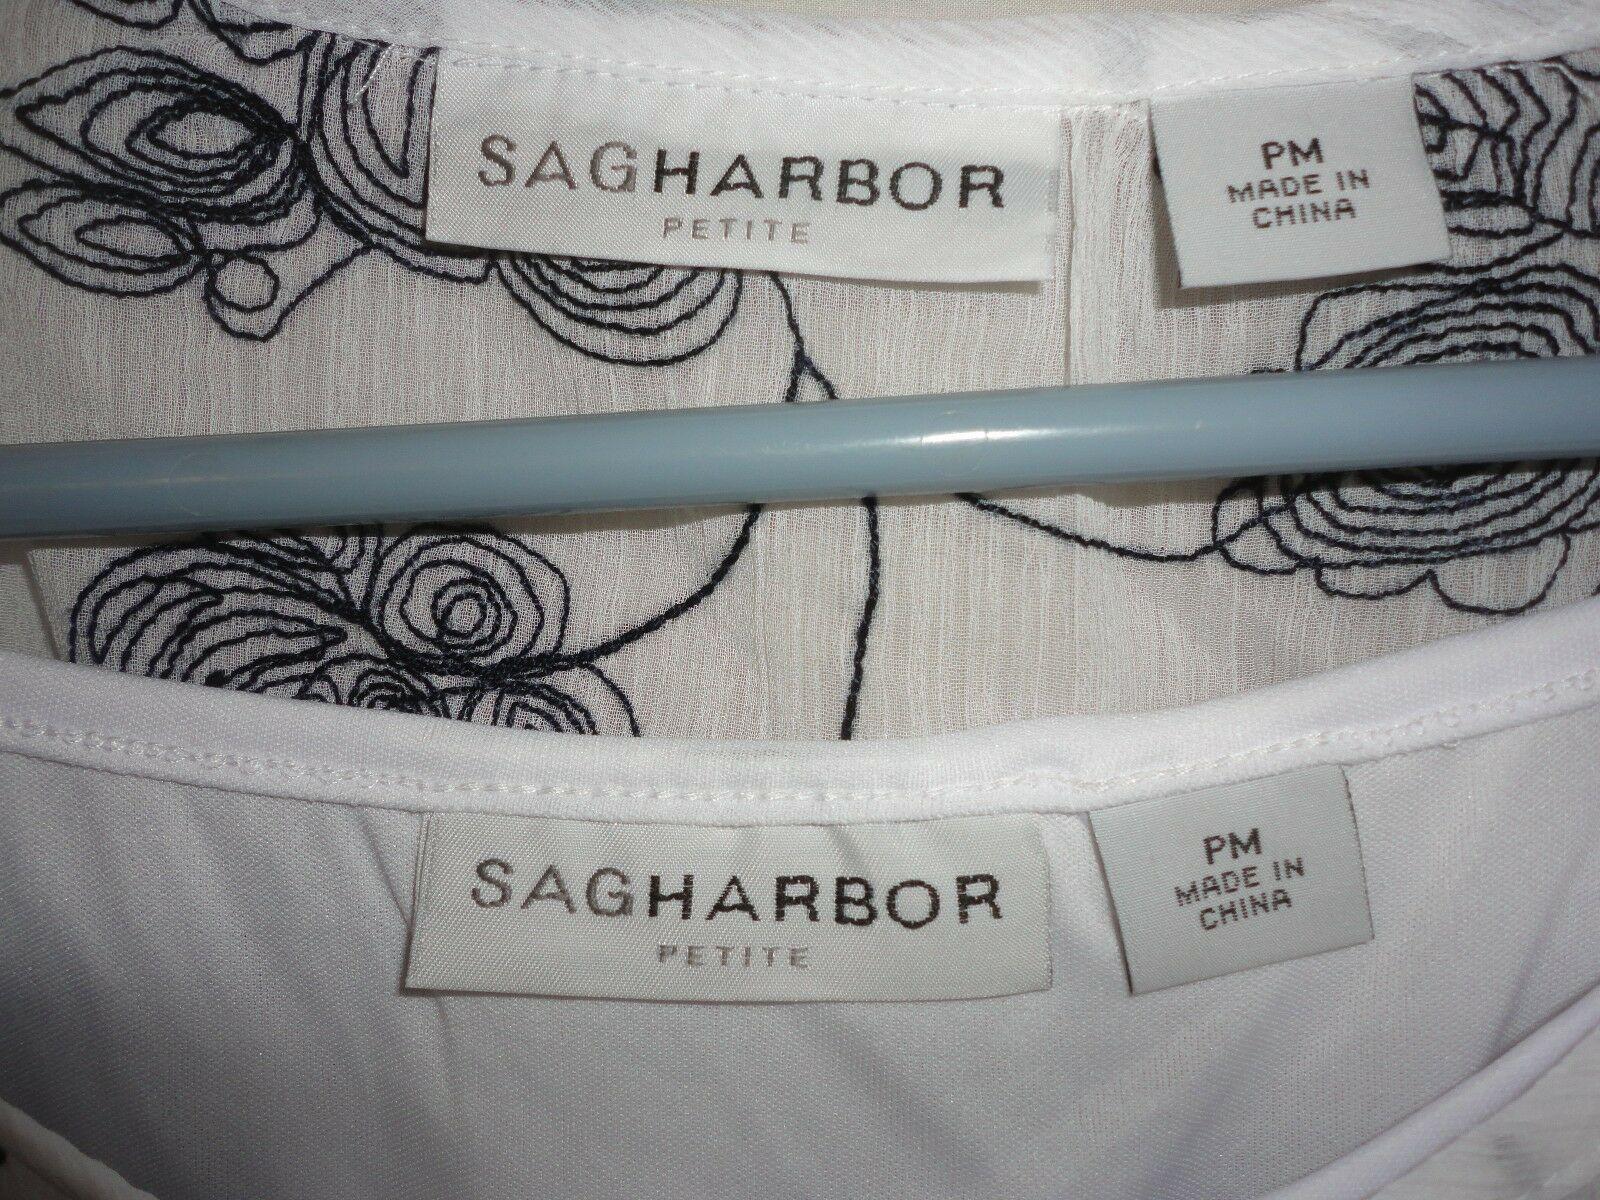 Sag Harbor Petite Women's 2 piece Sheer top w/ cami Size PM black / white floral